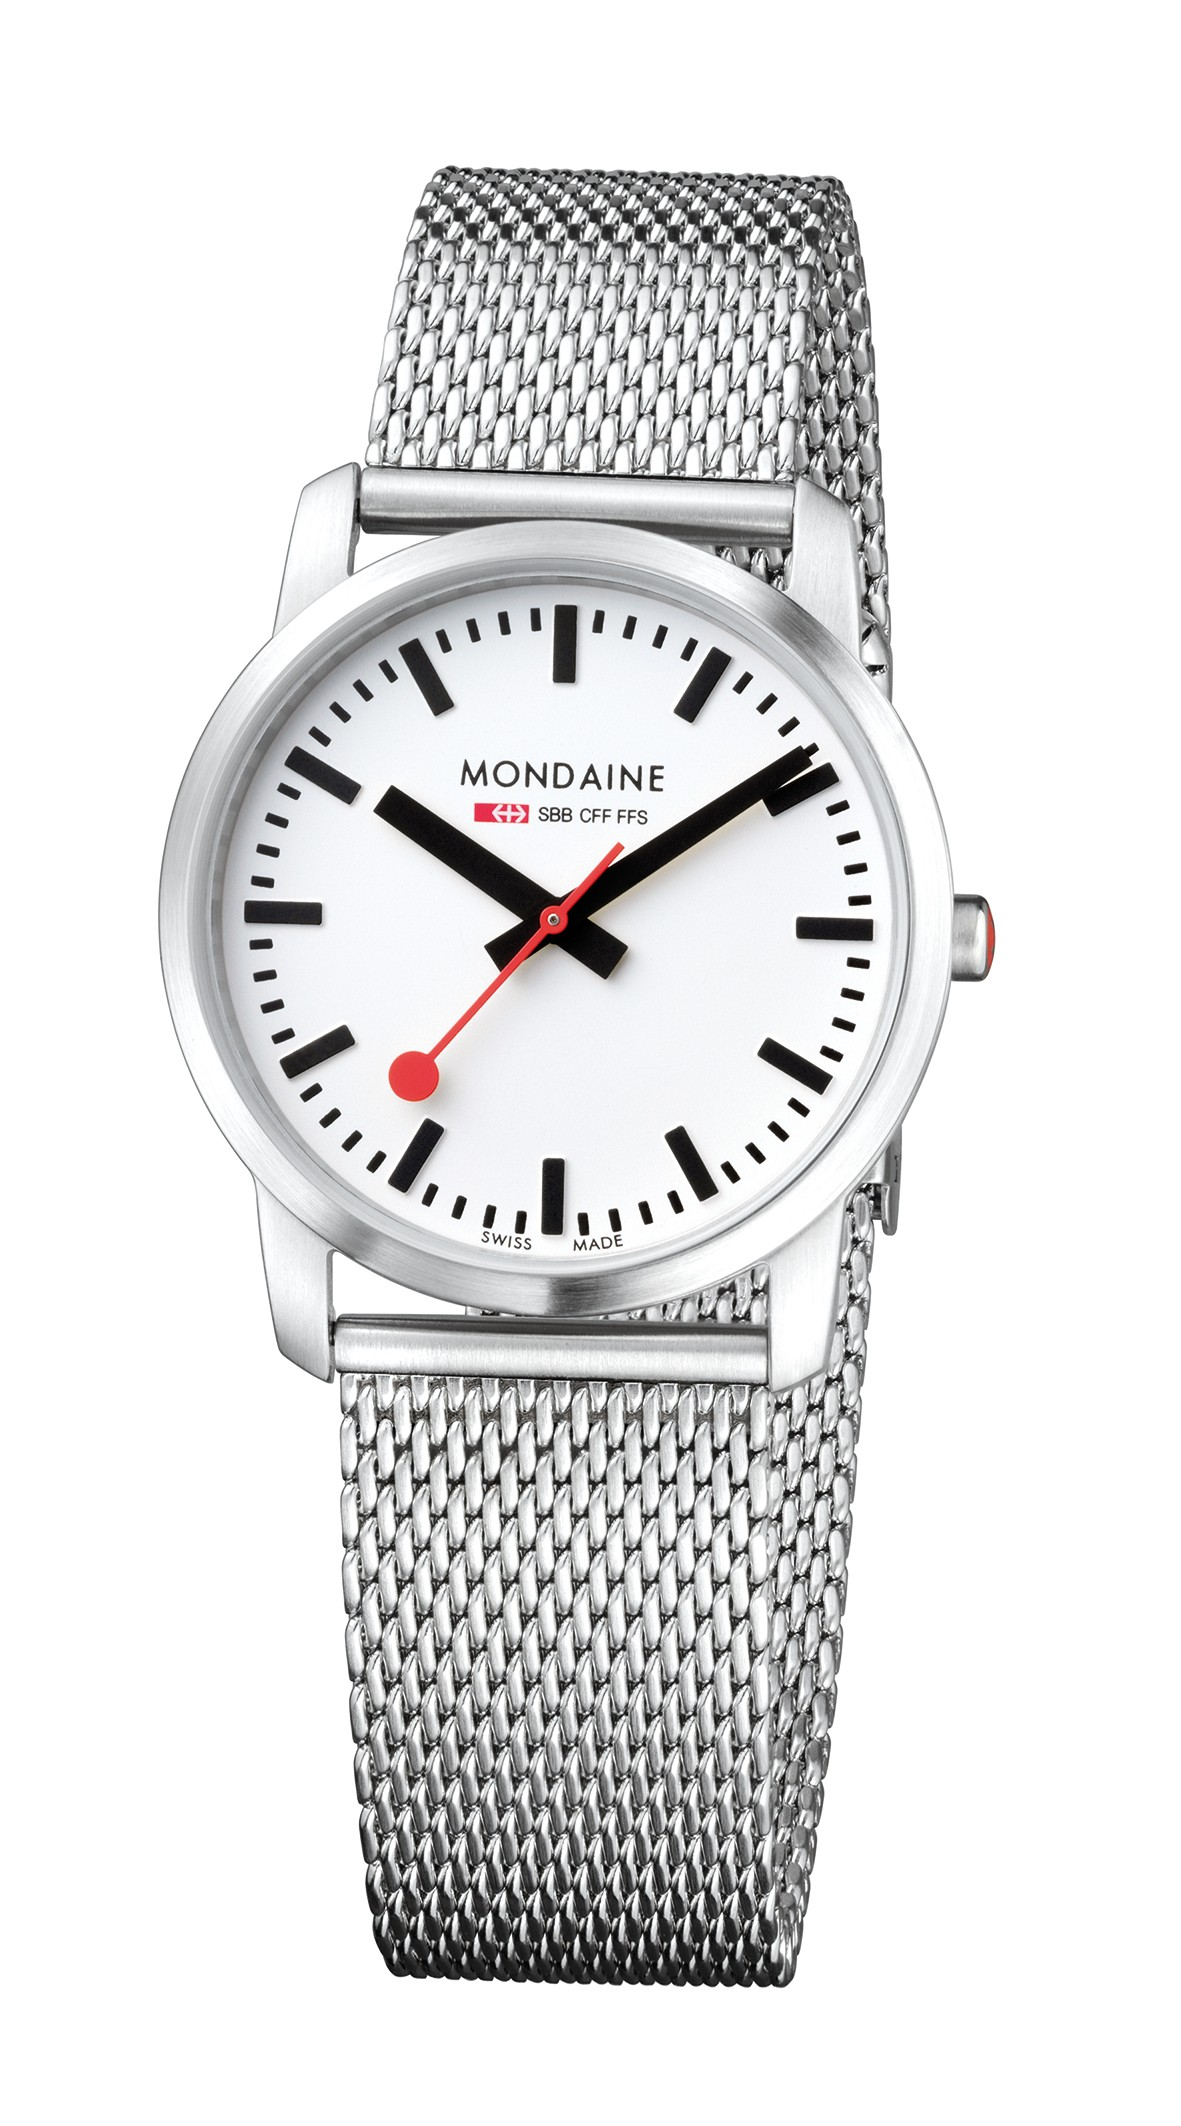 Mondaine swiss watch SIMPLY ELEGANT LADIES - A400.30351.16SBM